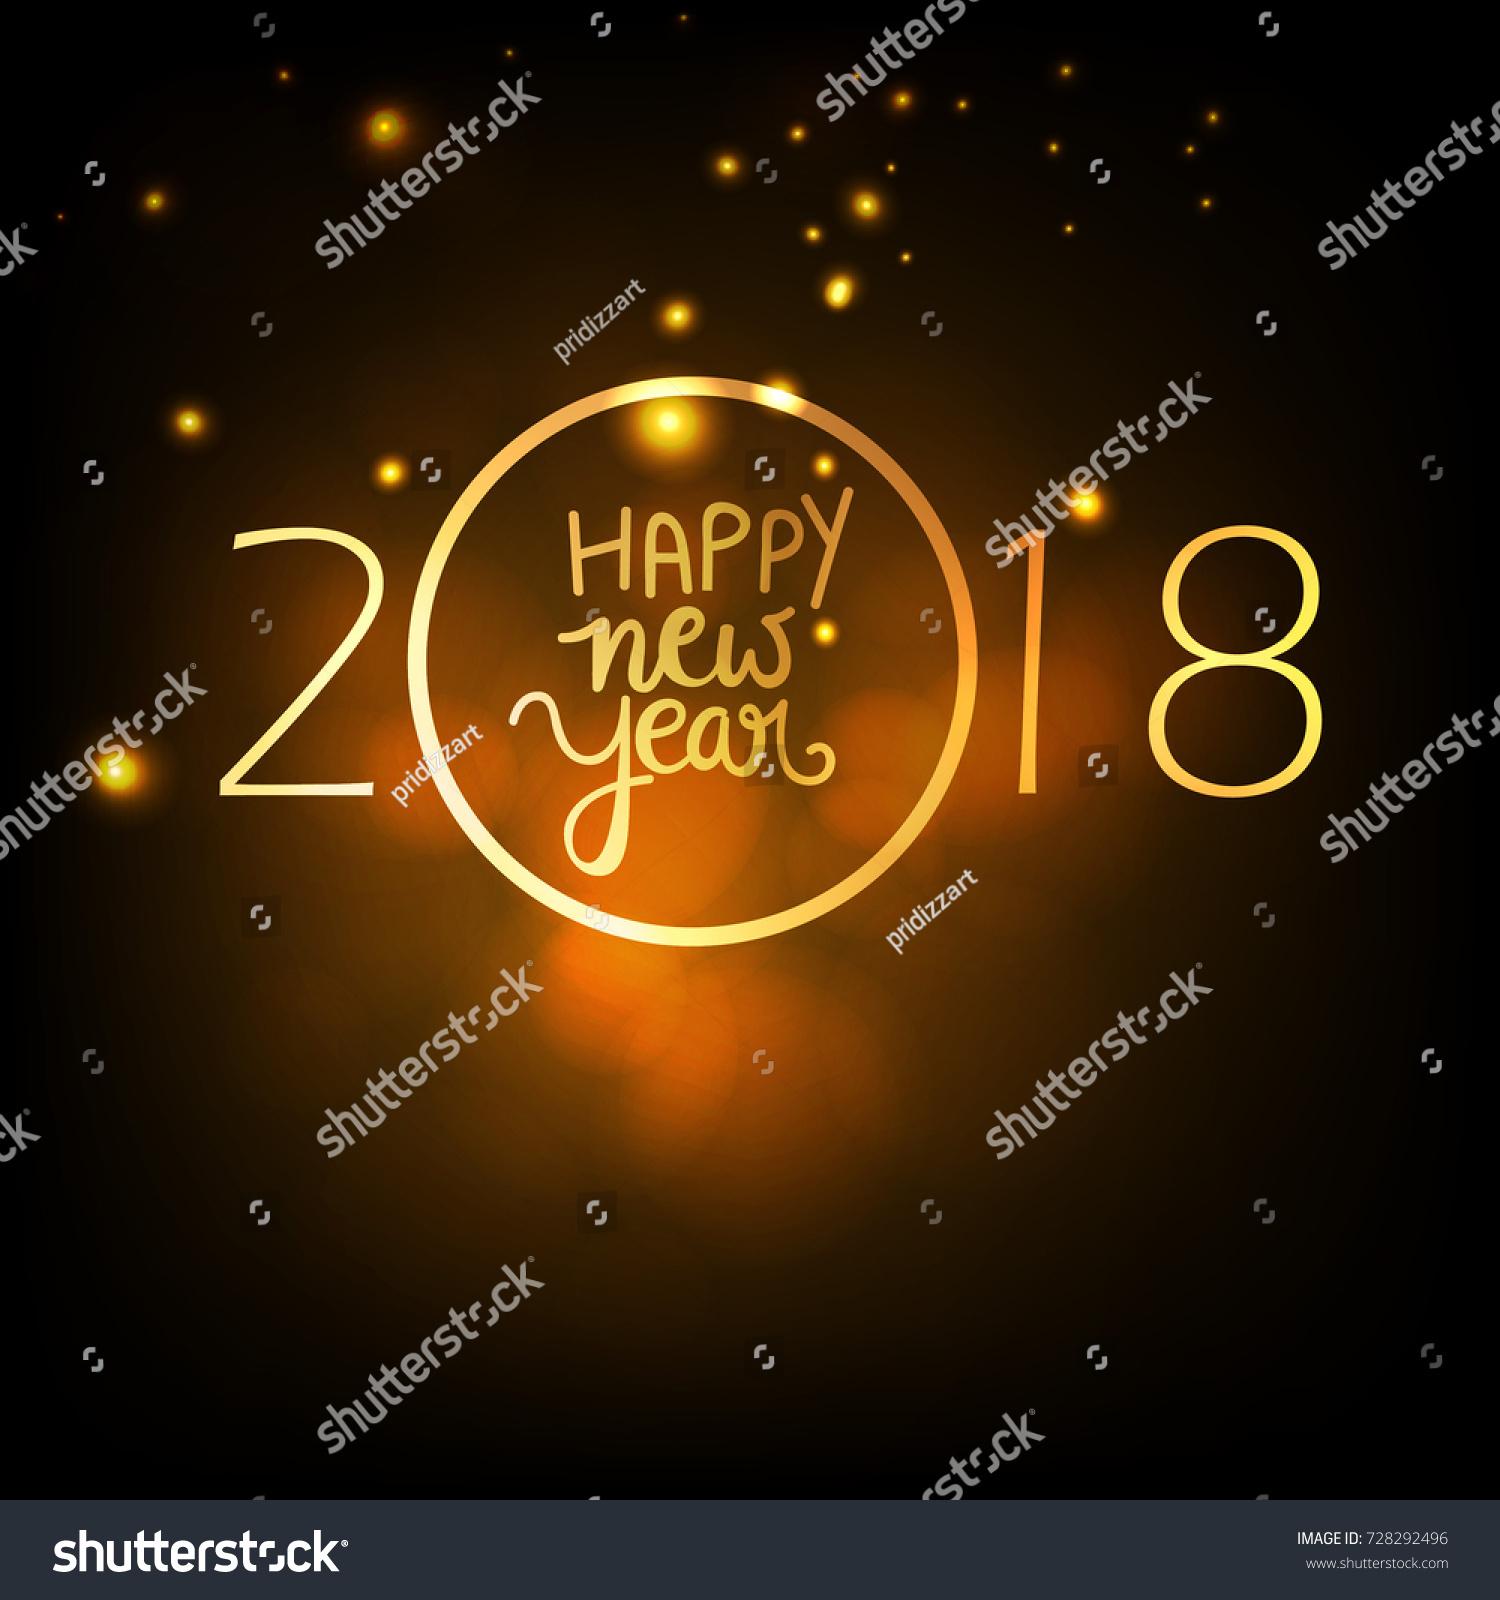 Happy New Year Wallpaper Design Image Vectorielle De Stock Libre De